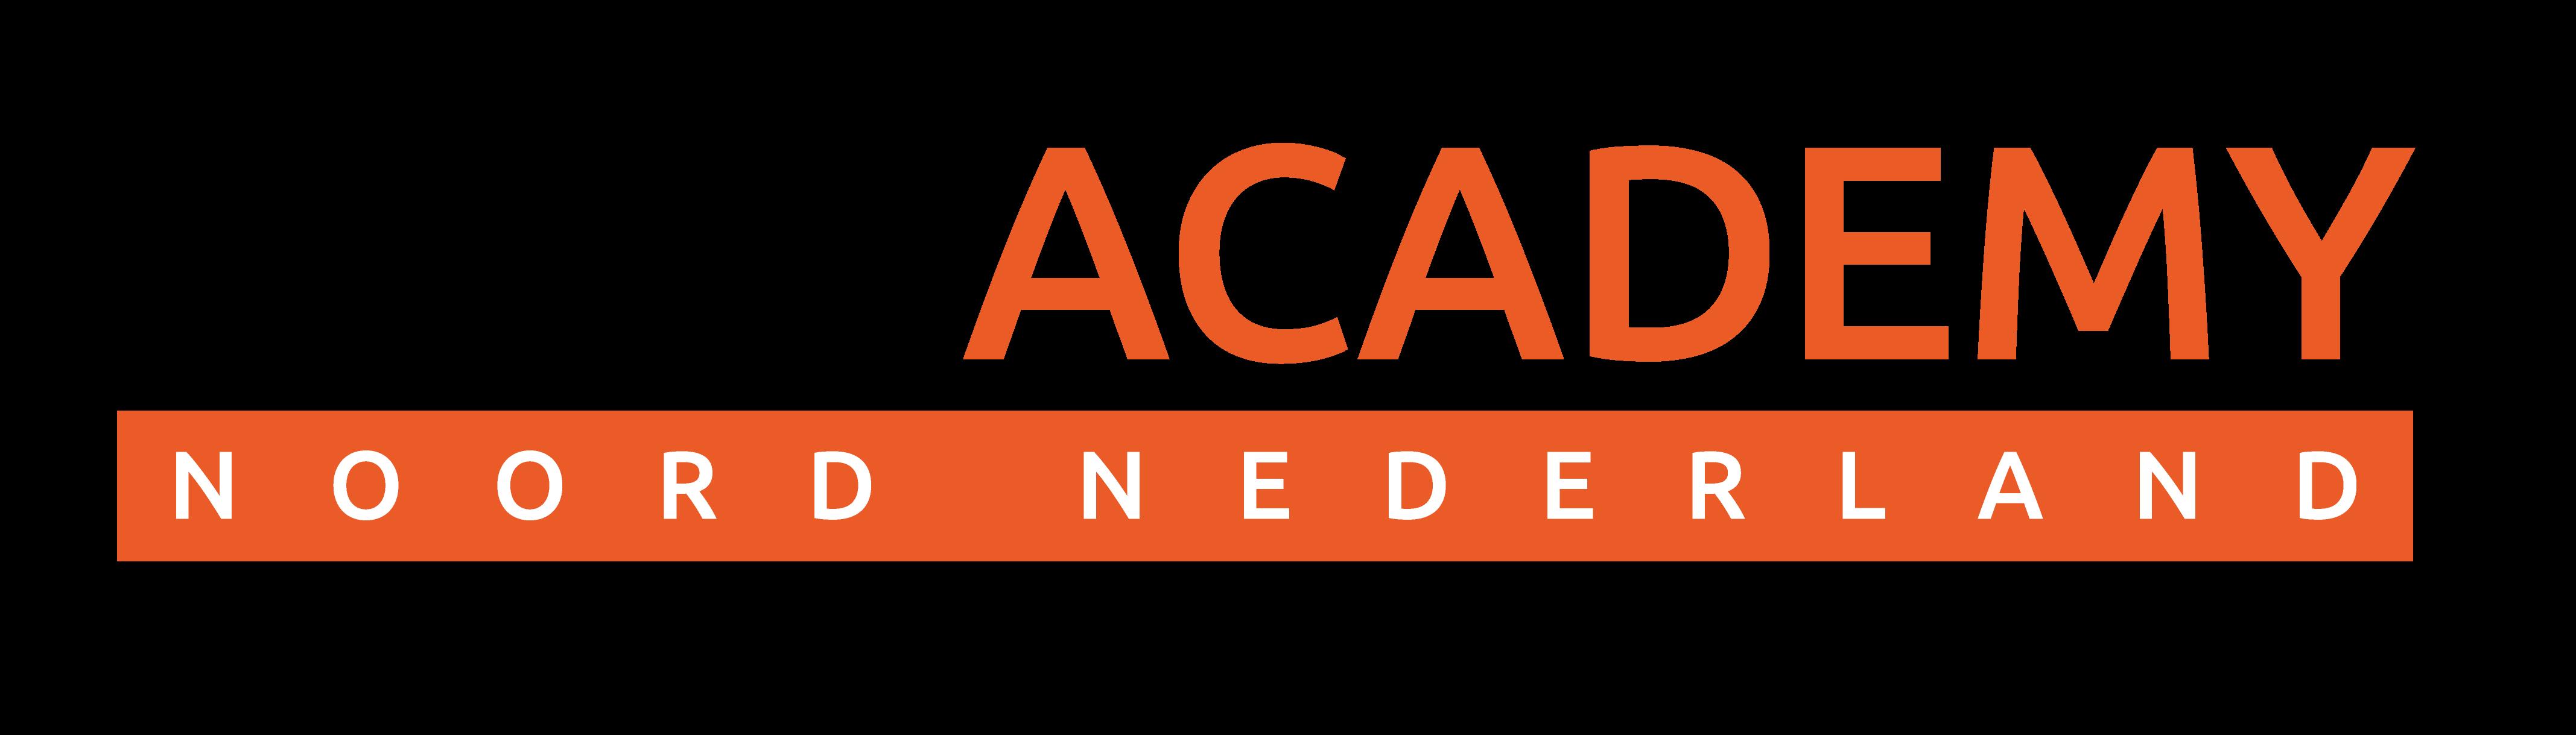 Acro Academy Noord Nederland